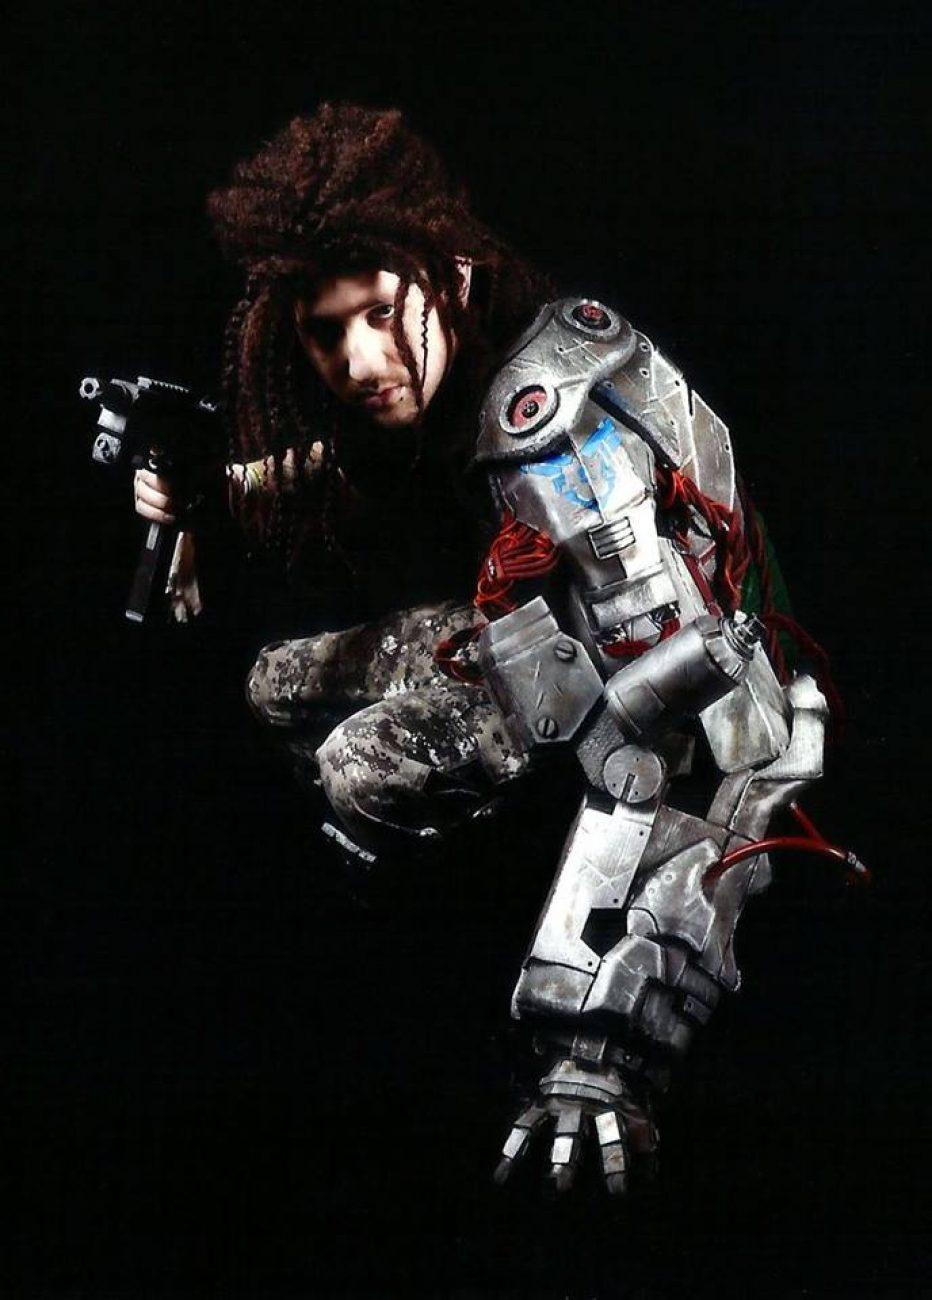 Bionic-Commando-Nathan-Spencer-Cosplay-Gamers-Heroes-4.jpg